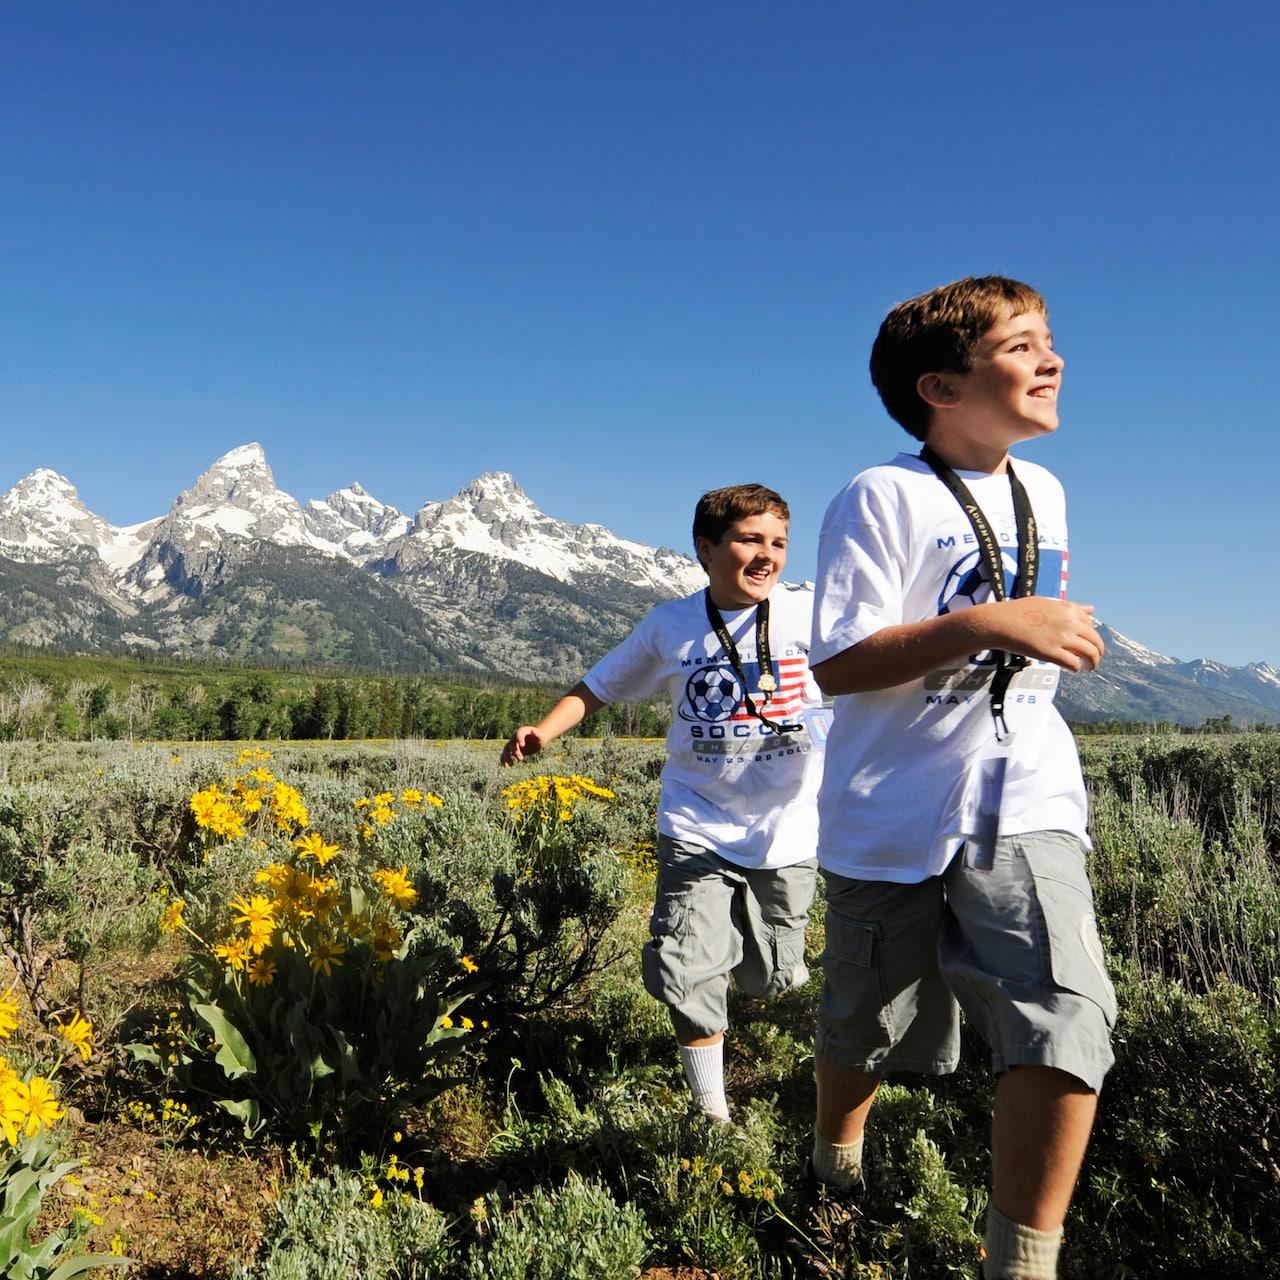 2 boys run through a field near snow dusted mountains